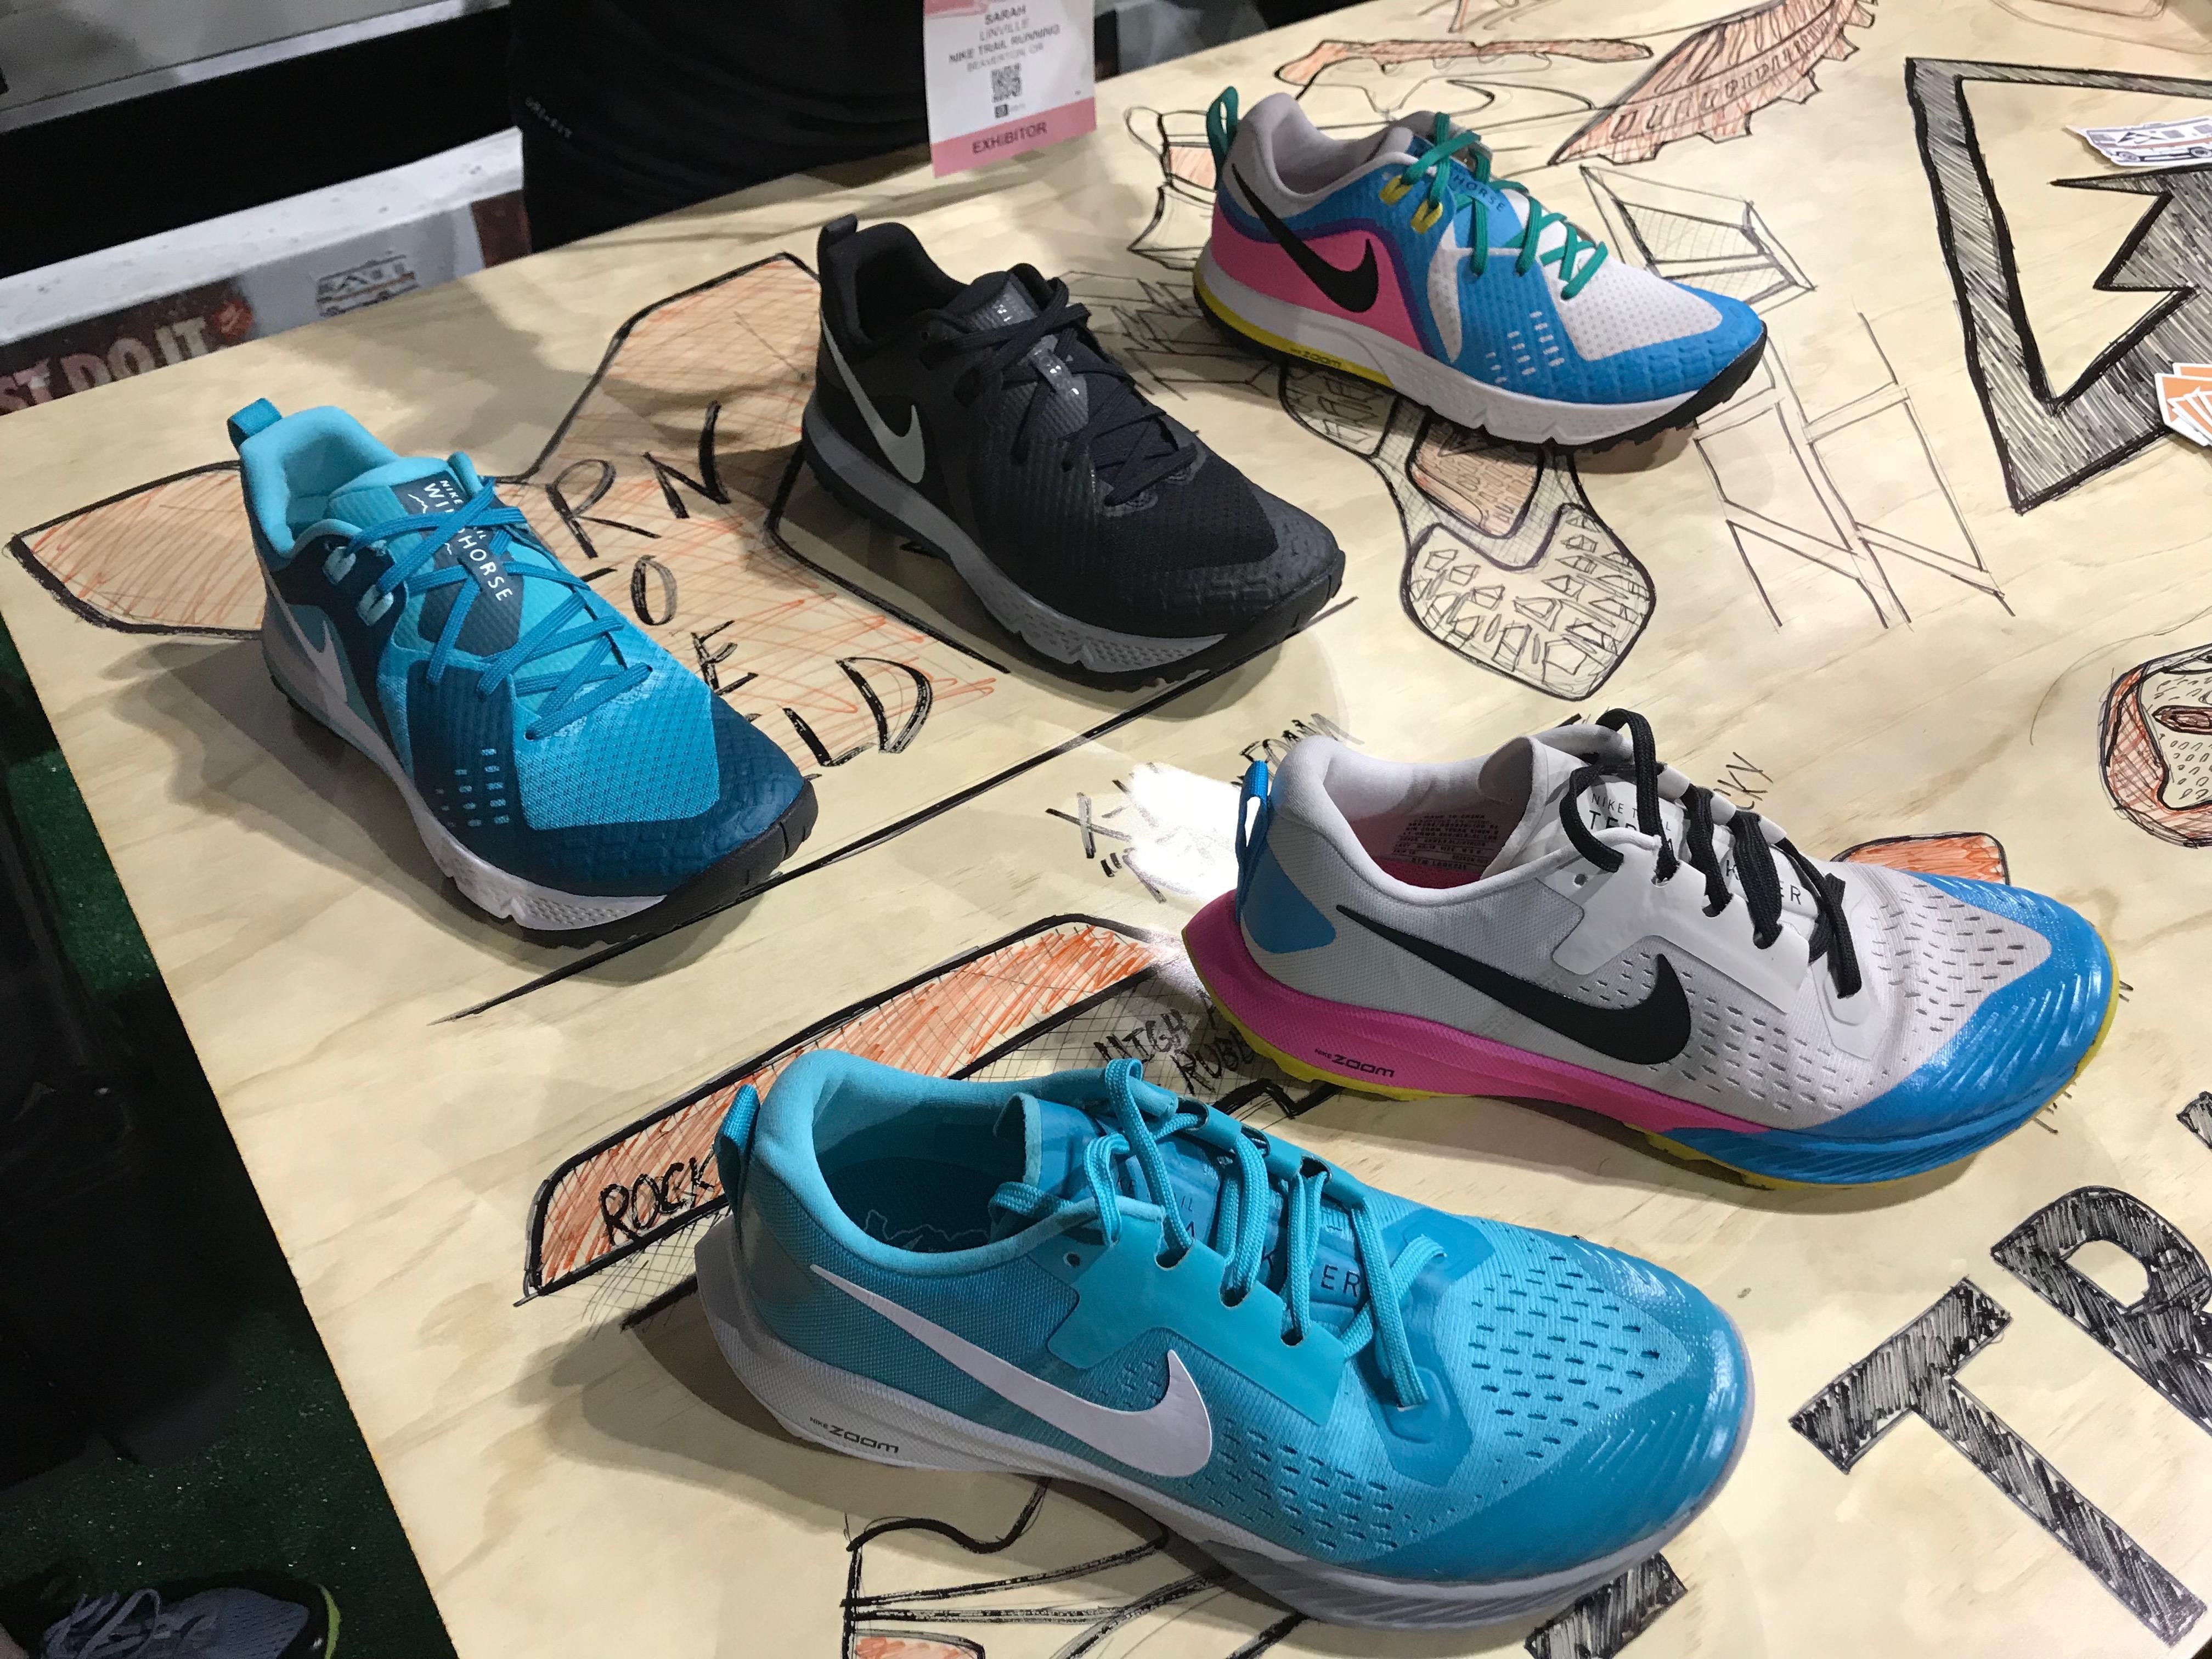 871be99ee4b1 Outdoor Retailer 2018 Summer Market Recap – Nike Highlights